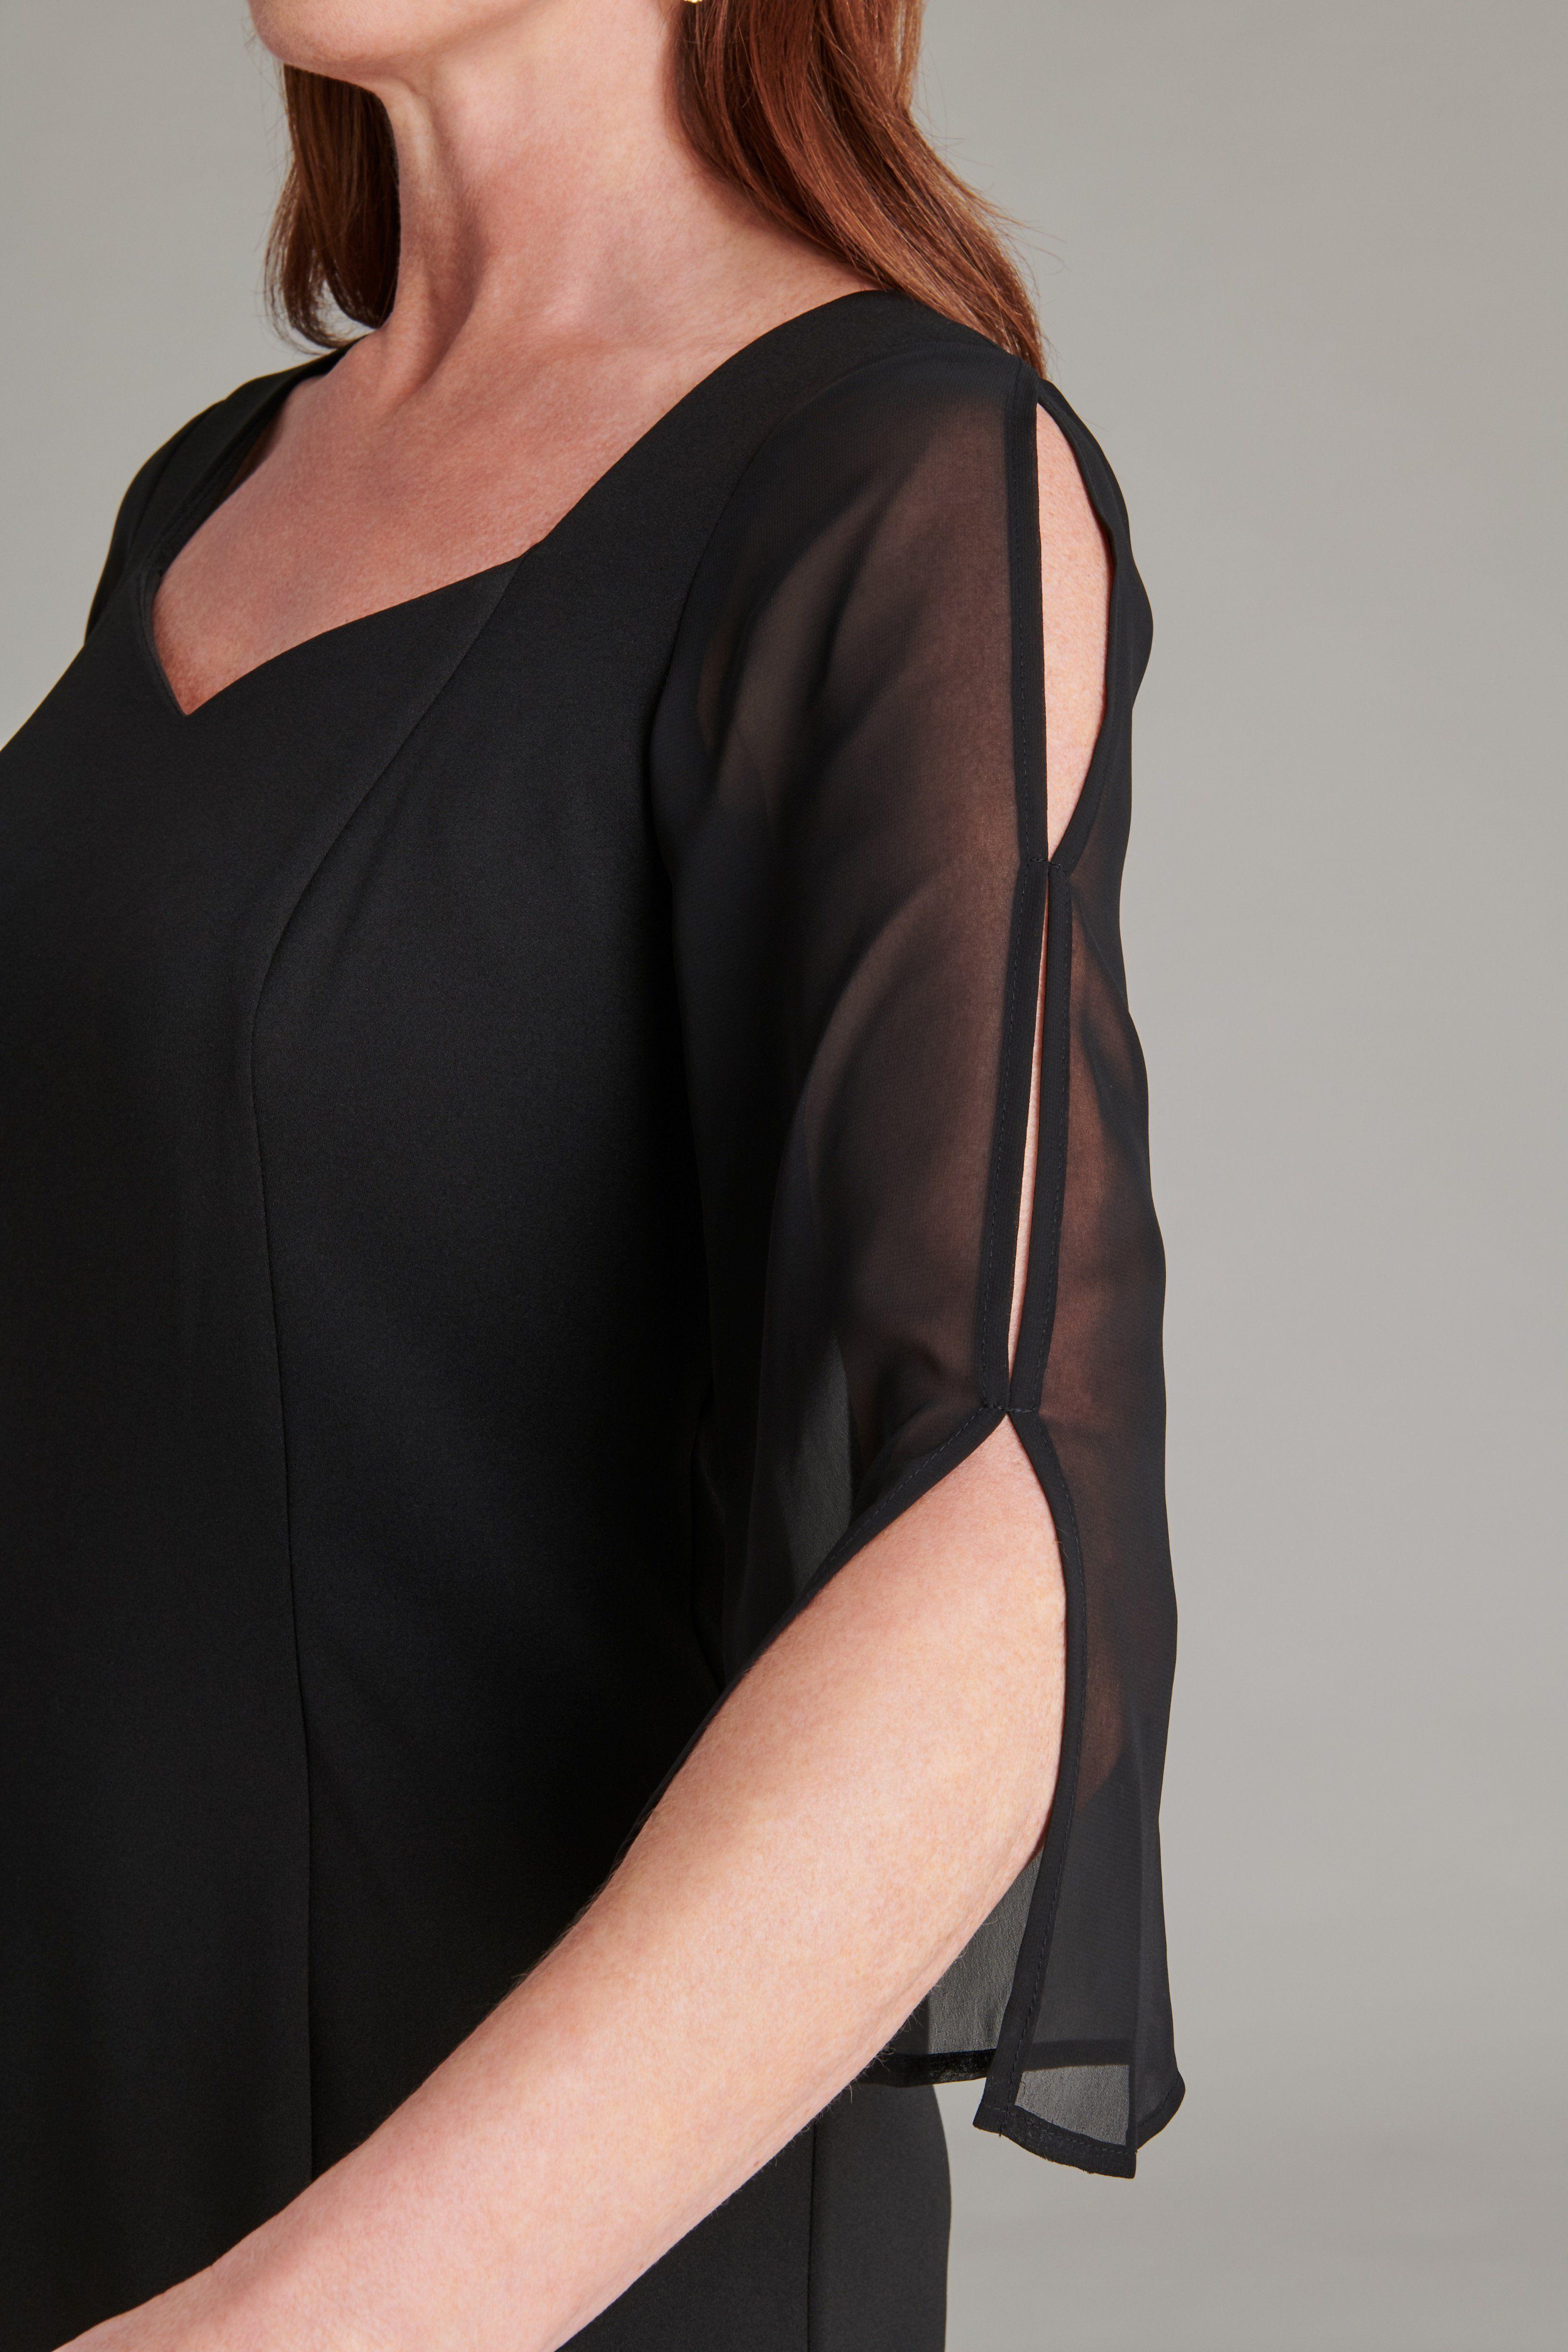 Black Structured Bodice Maxi Dress Maxi Dress Structured Dress Formal Dresses For Teens [ 1180 x 740 Pixel ]